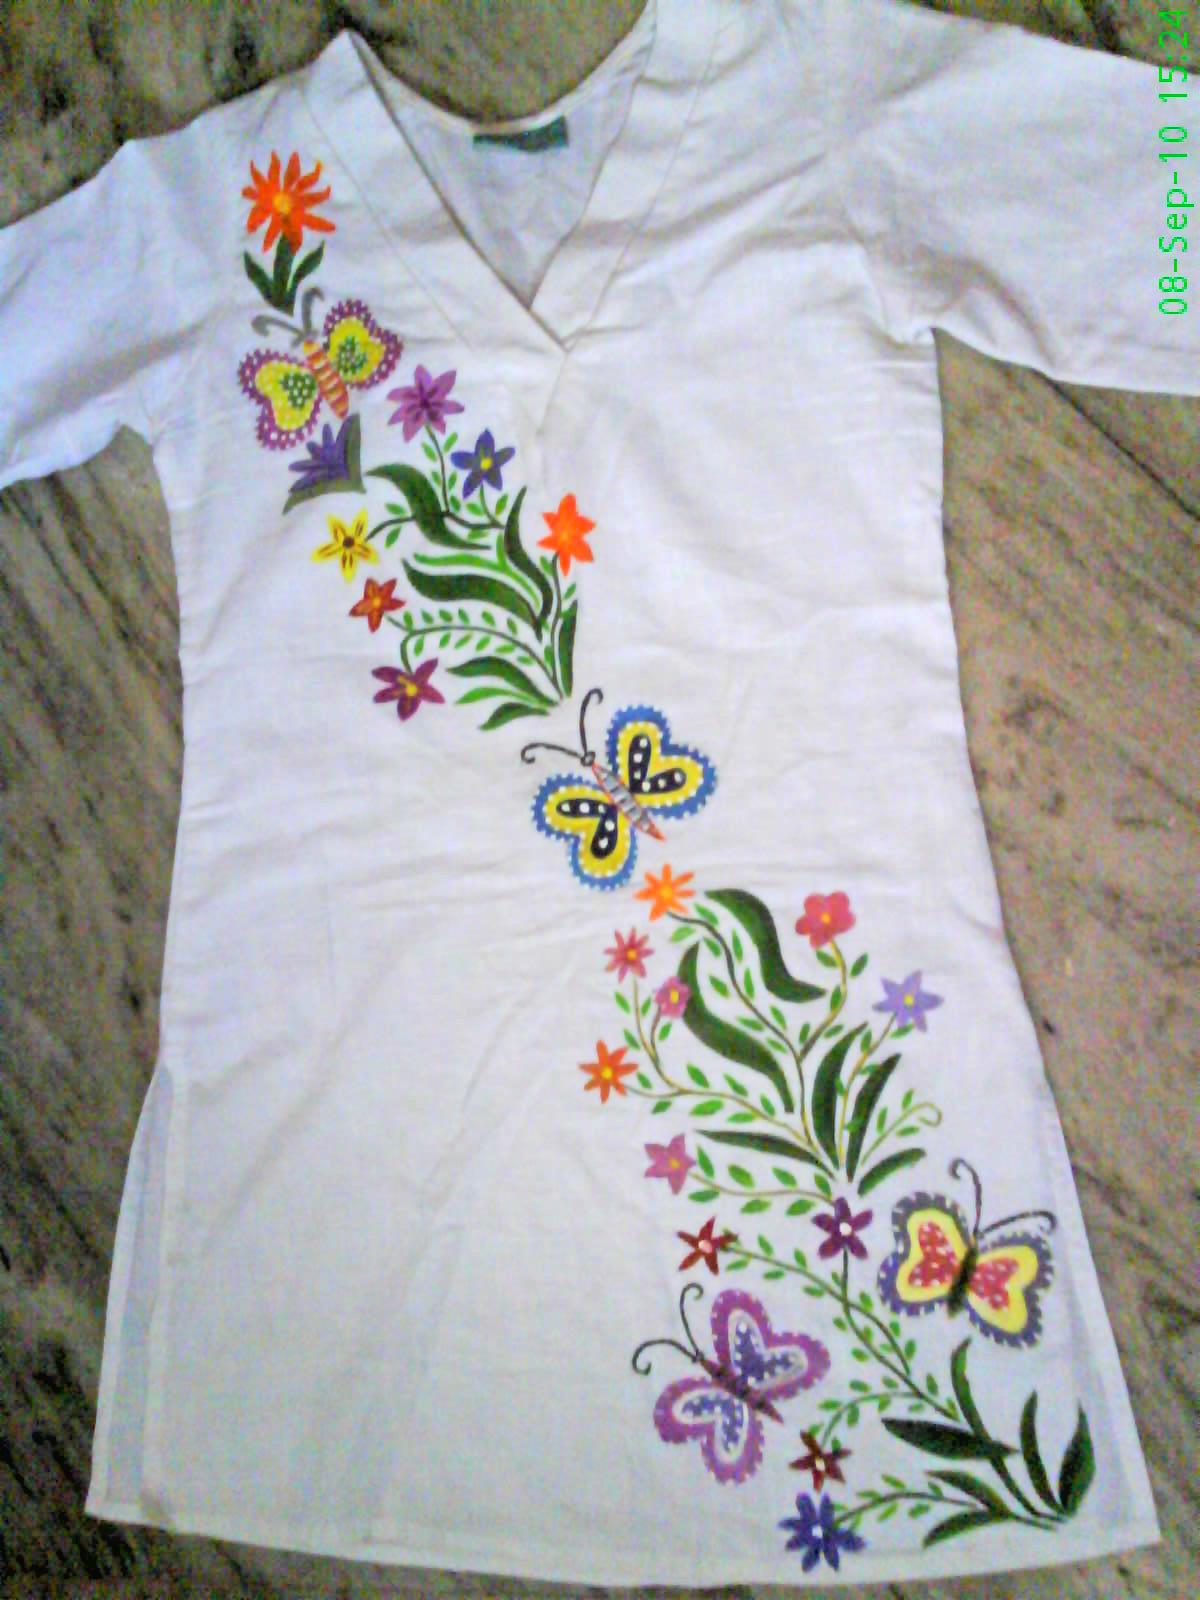 Myriad of memories: Fabric painting